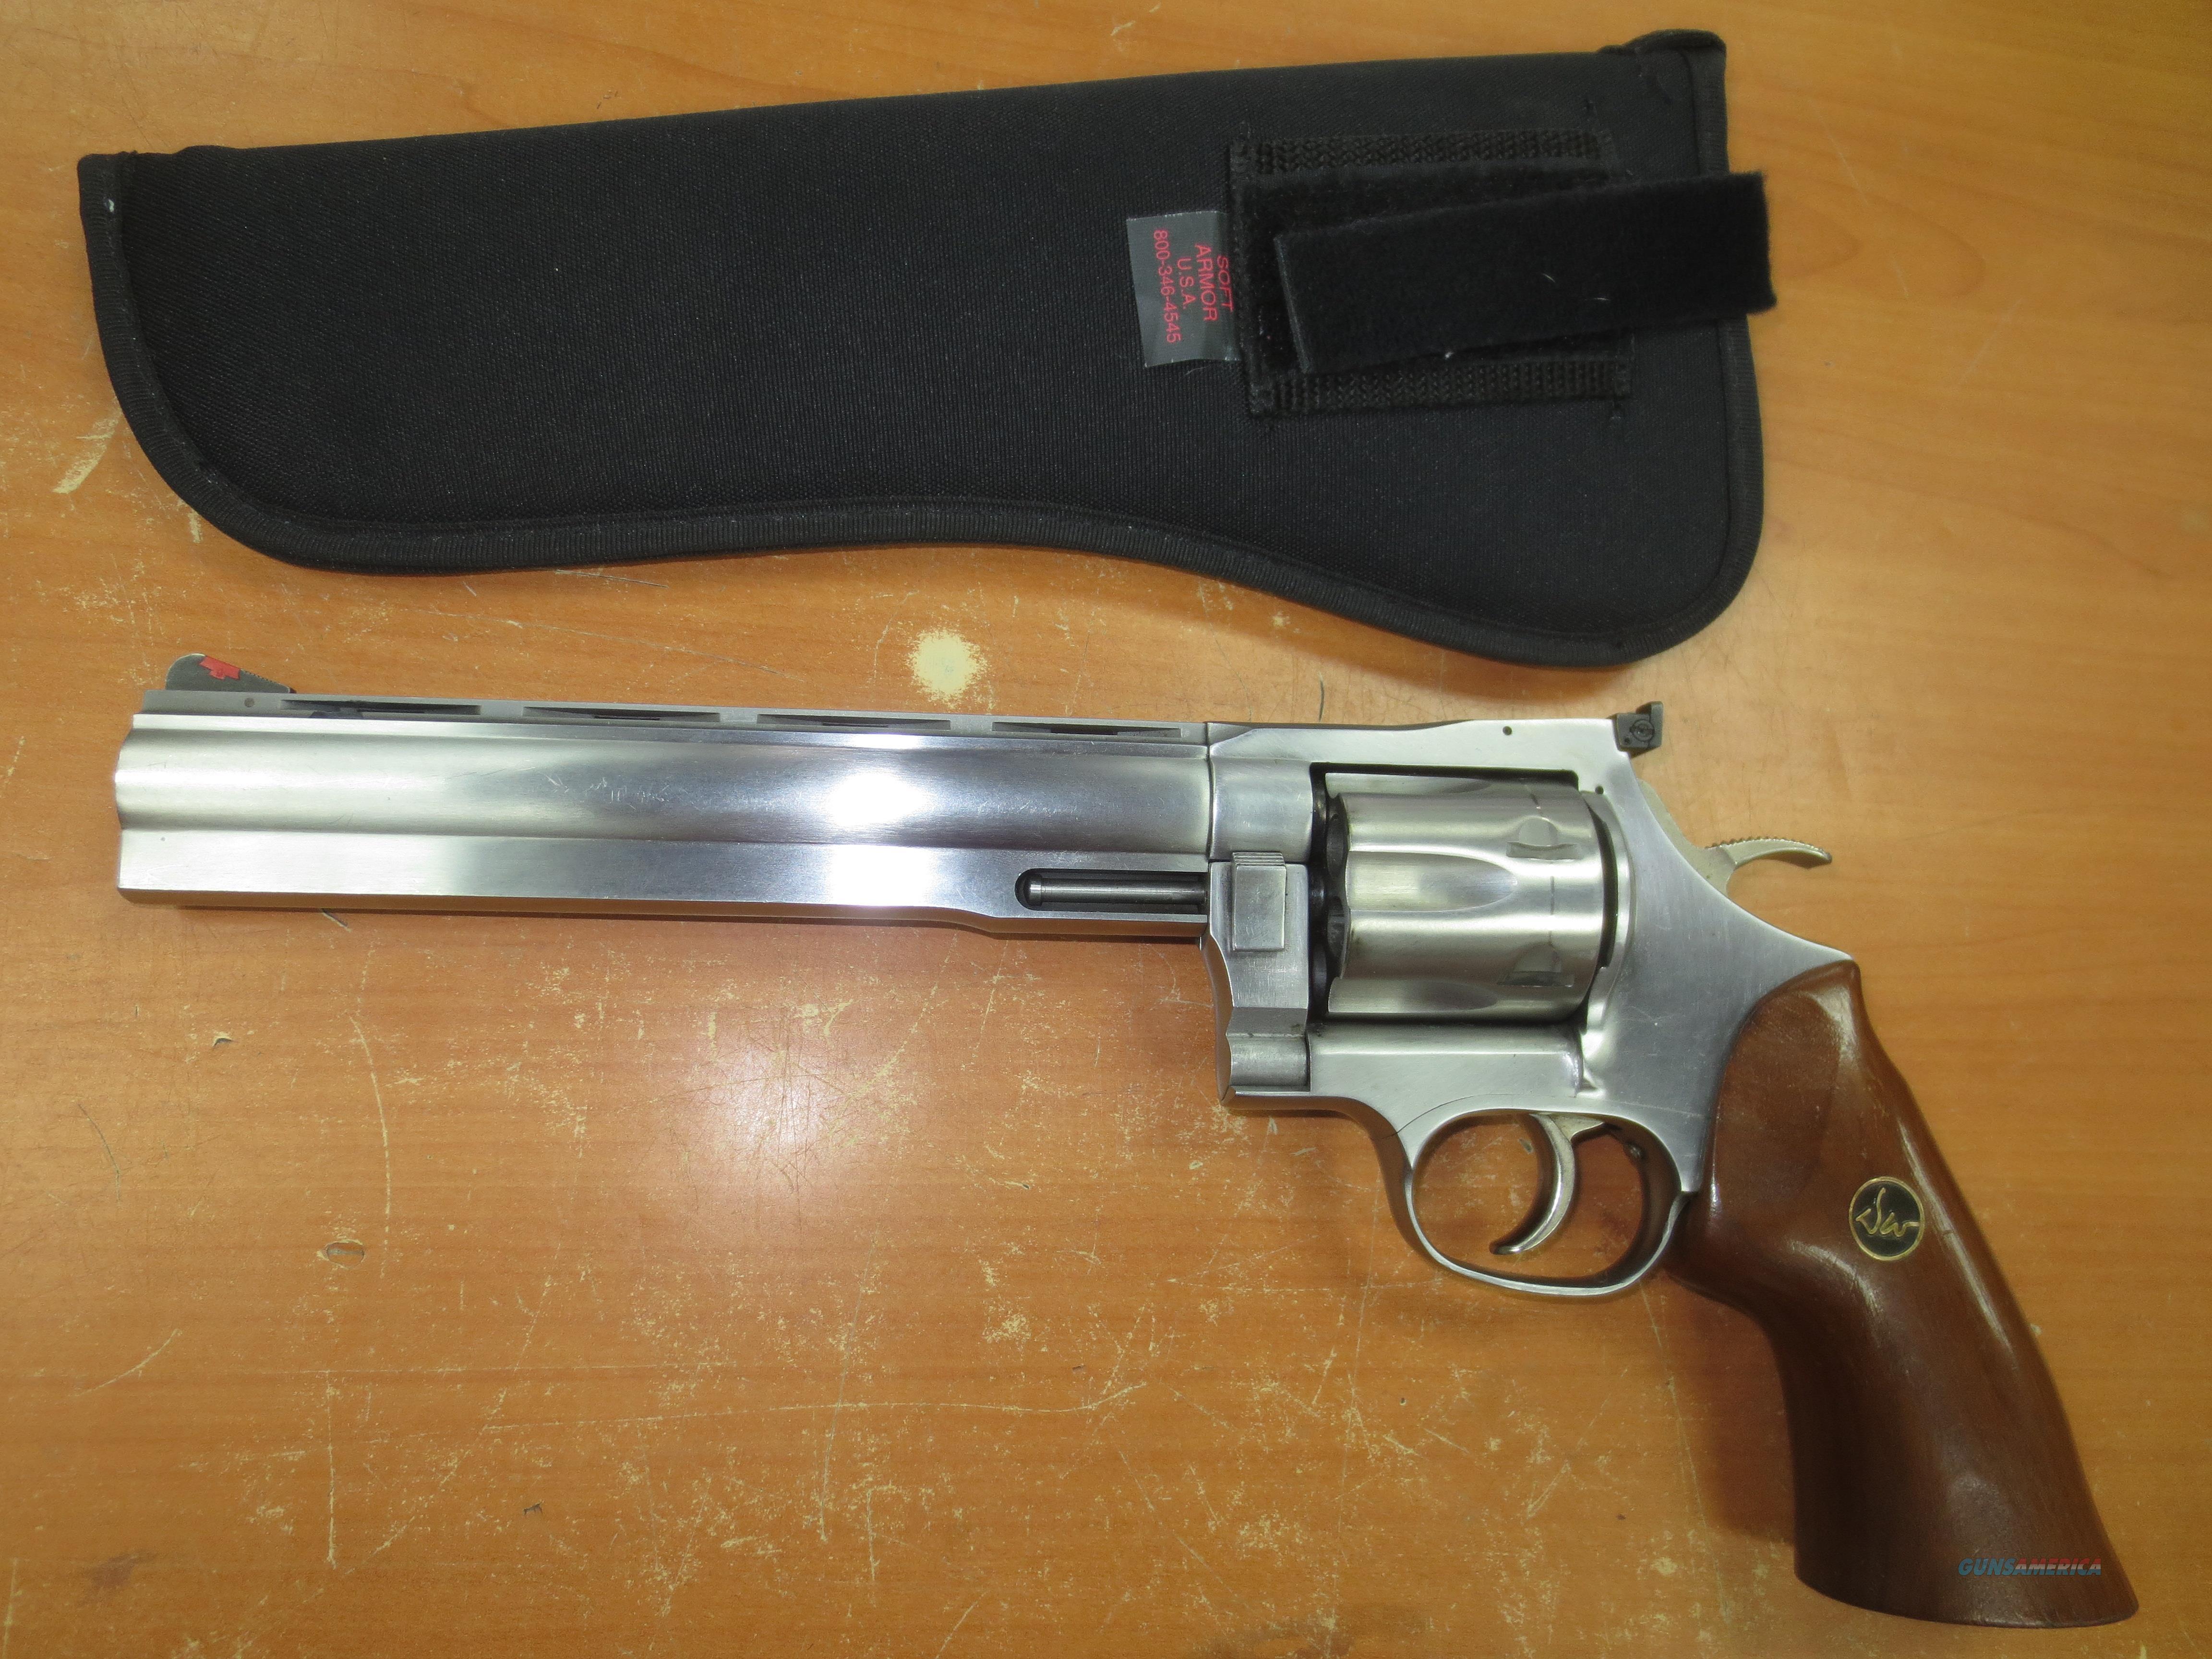 Dan Wesson model 44 long barrel .44 Mag (Not CA qualified)   Guns > Pistols > Dan Wesson Pistols/Revolvers > Revolvers